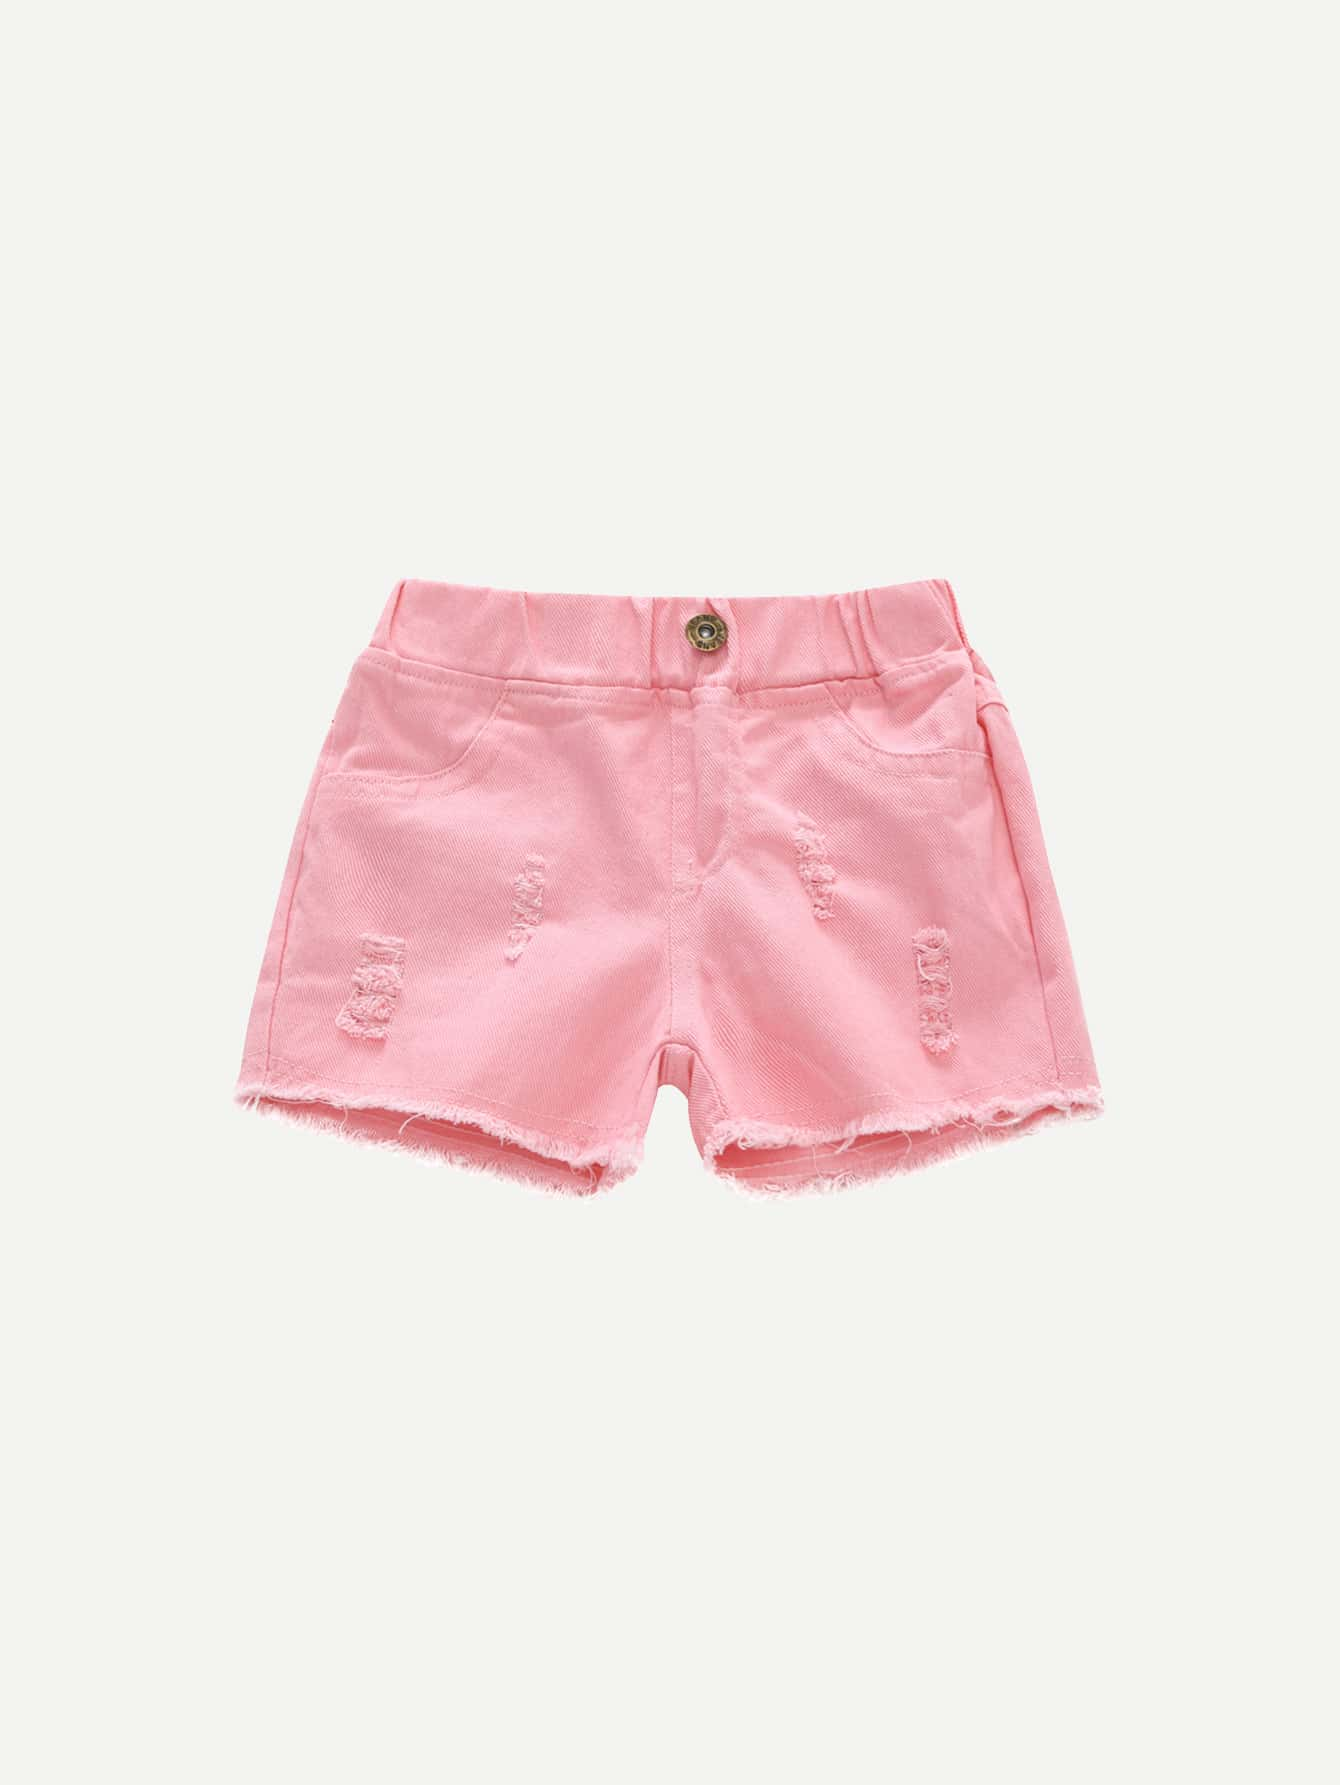 Купить Девушки Raw Hem Ripped Shorts, null, SheIn